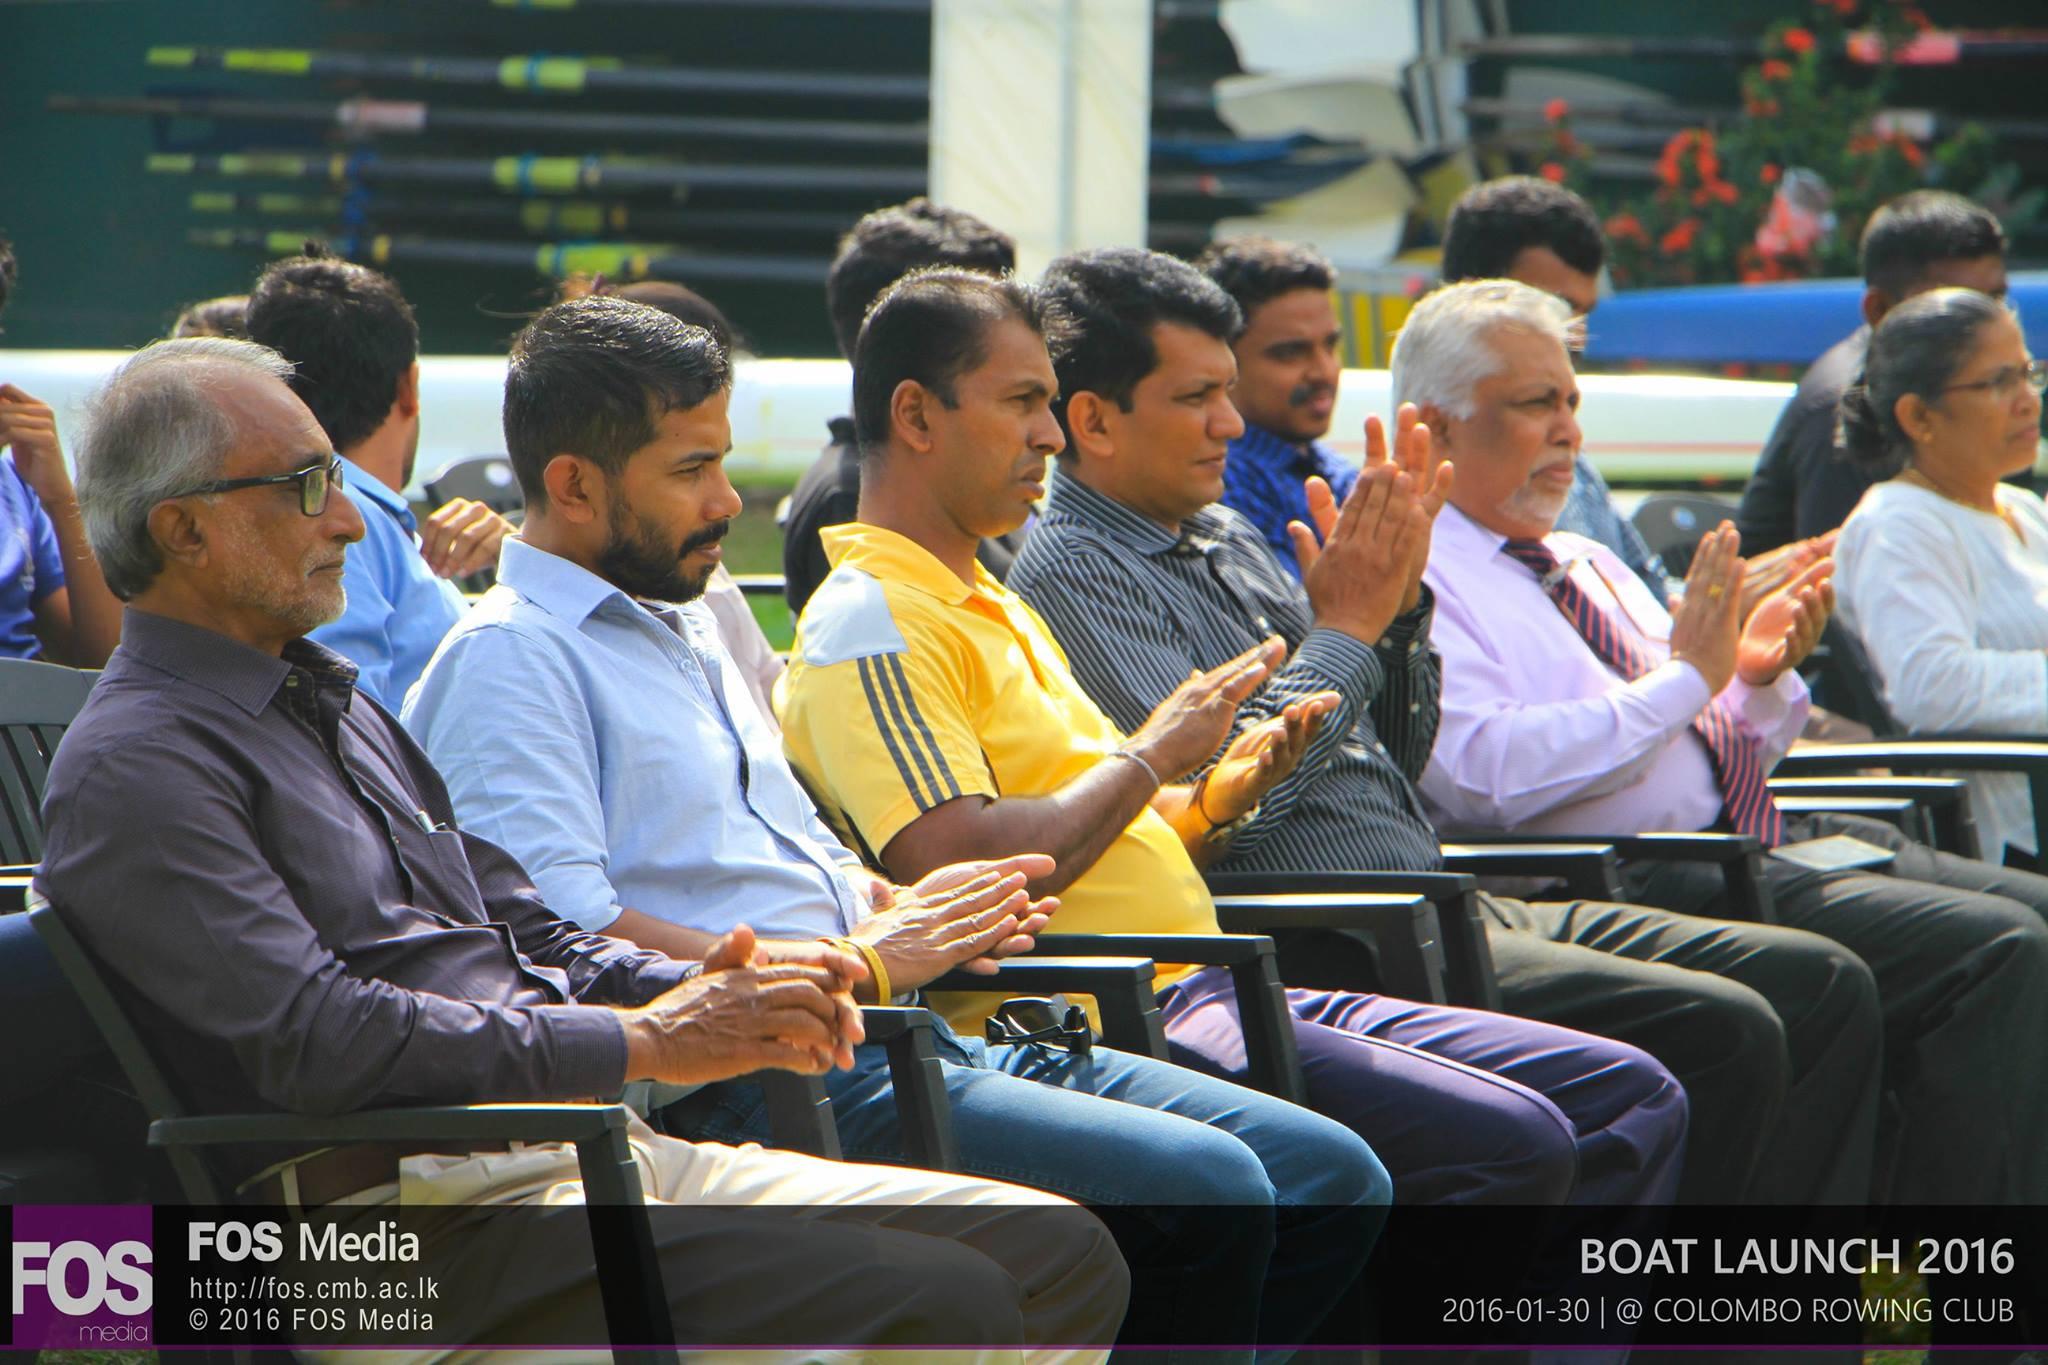 Boat Launch 2016 6